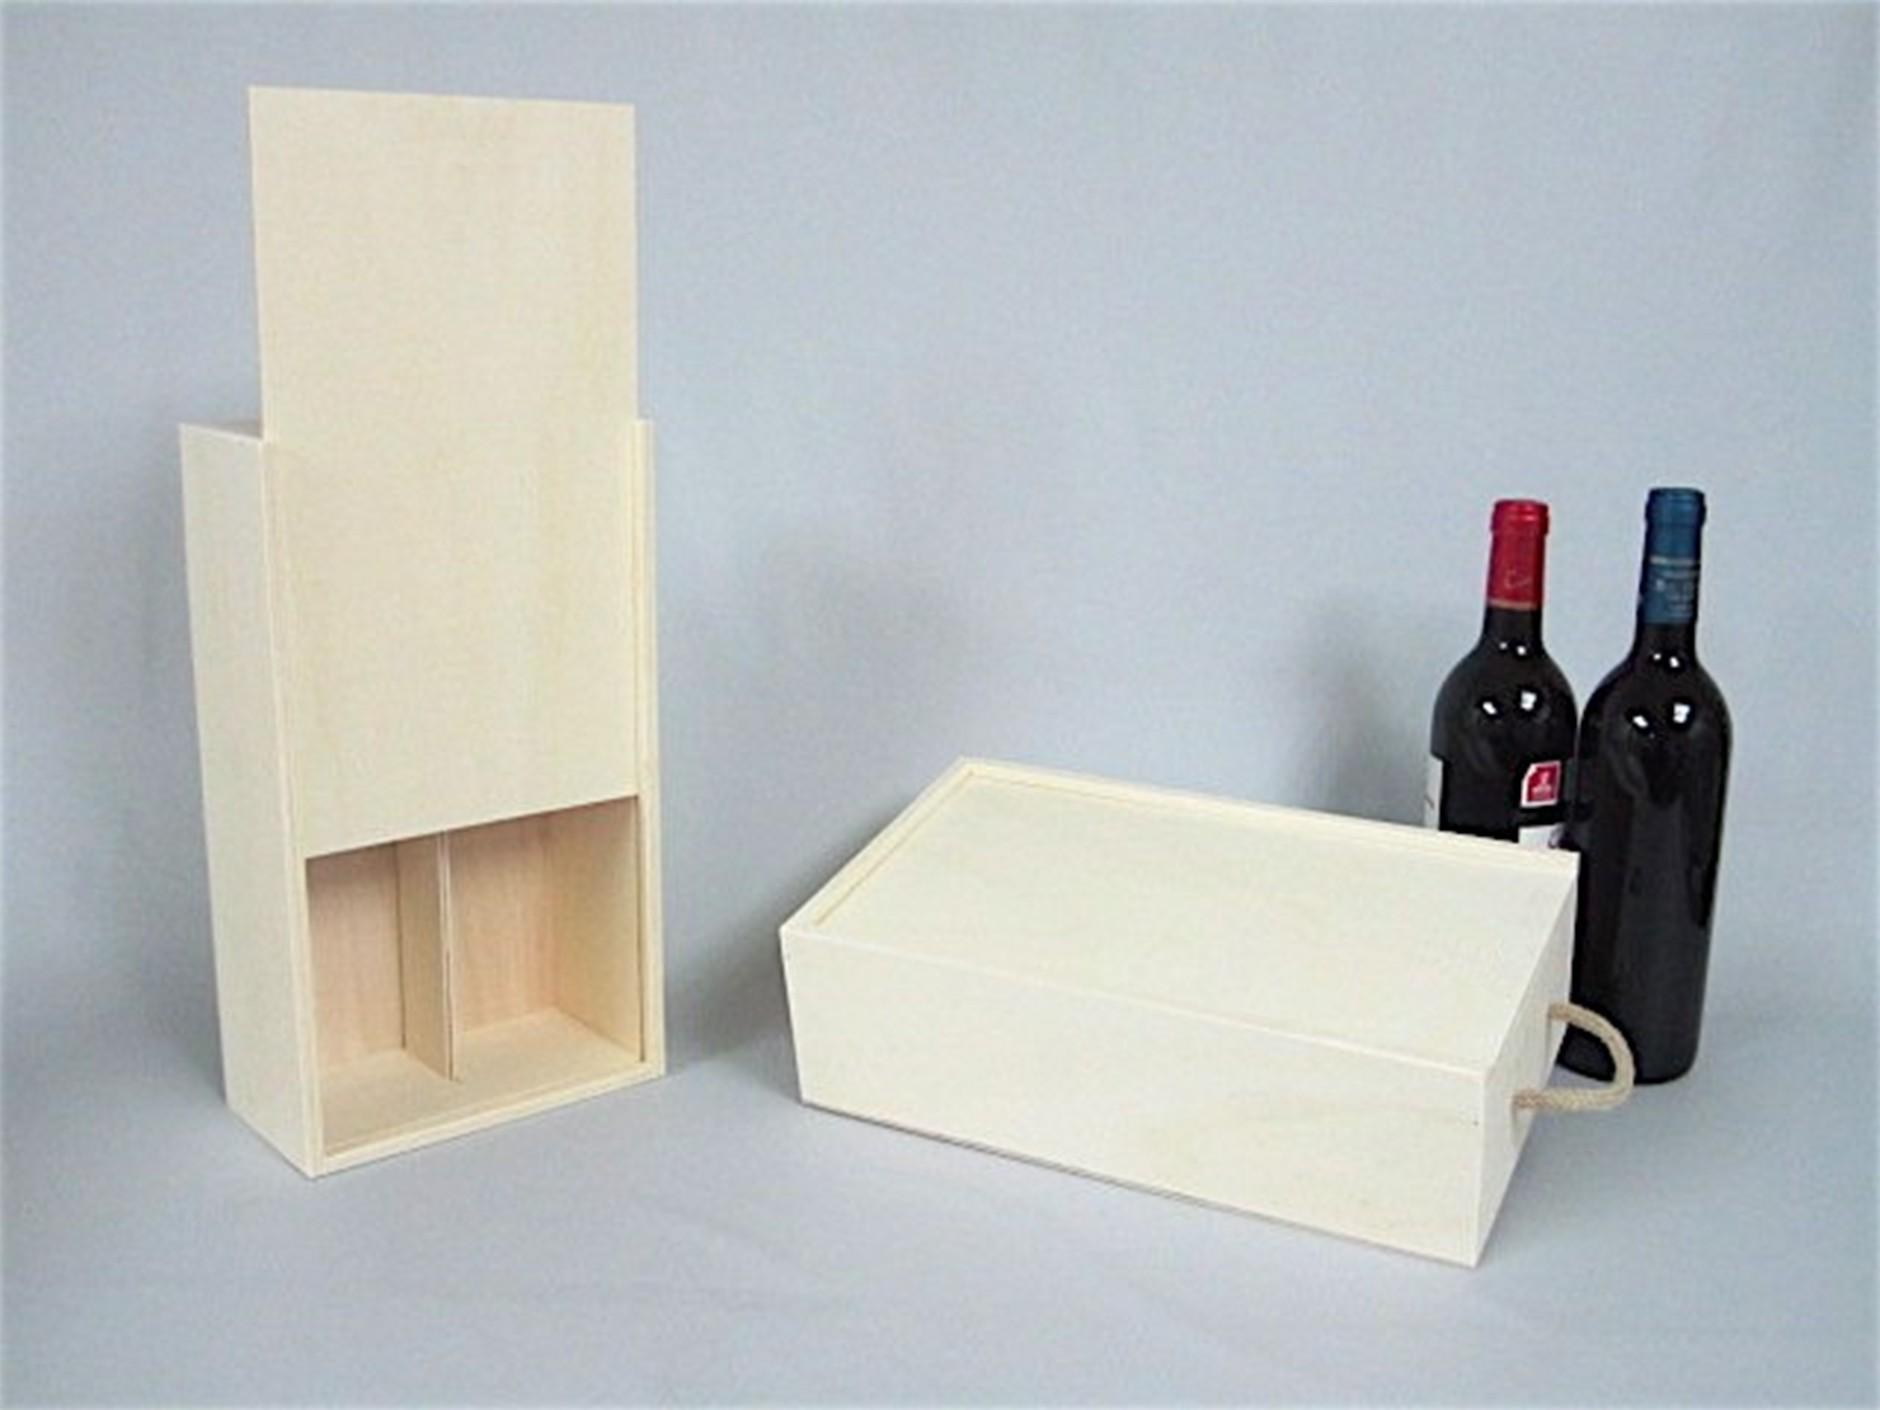 Caja 2 Botellas de vino Tapa Corredera Ref.2botTC